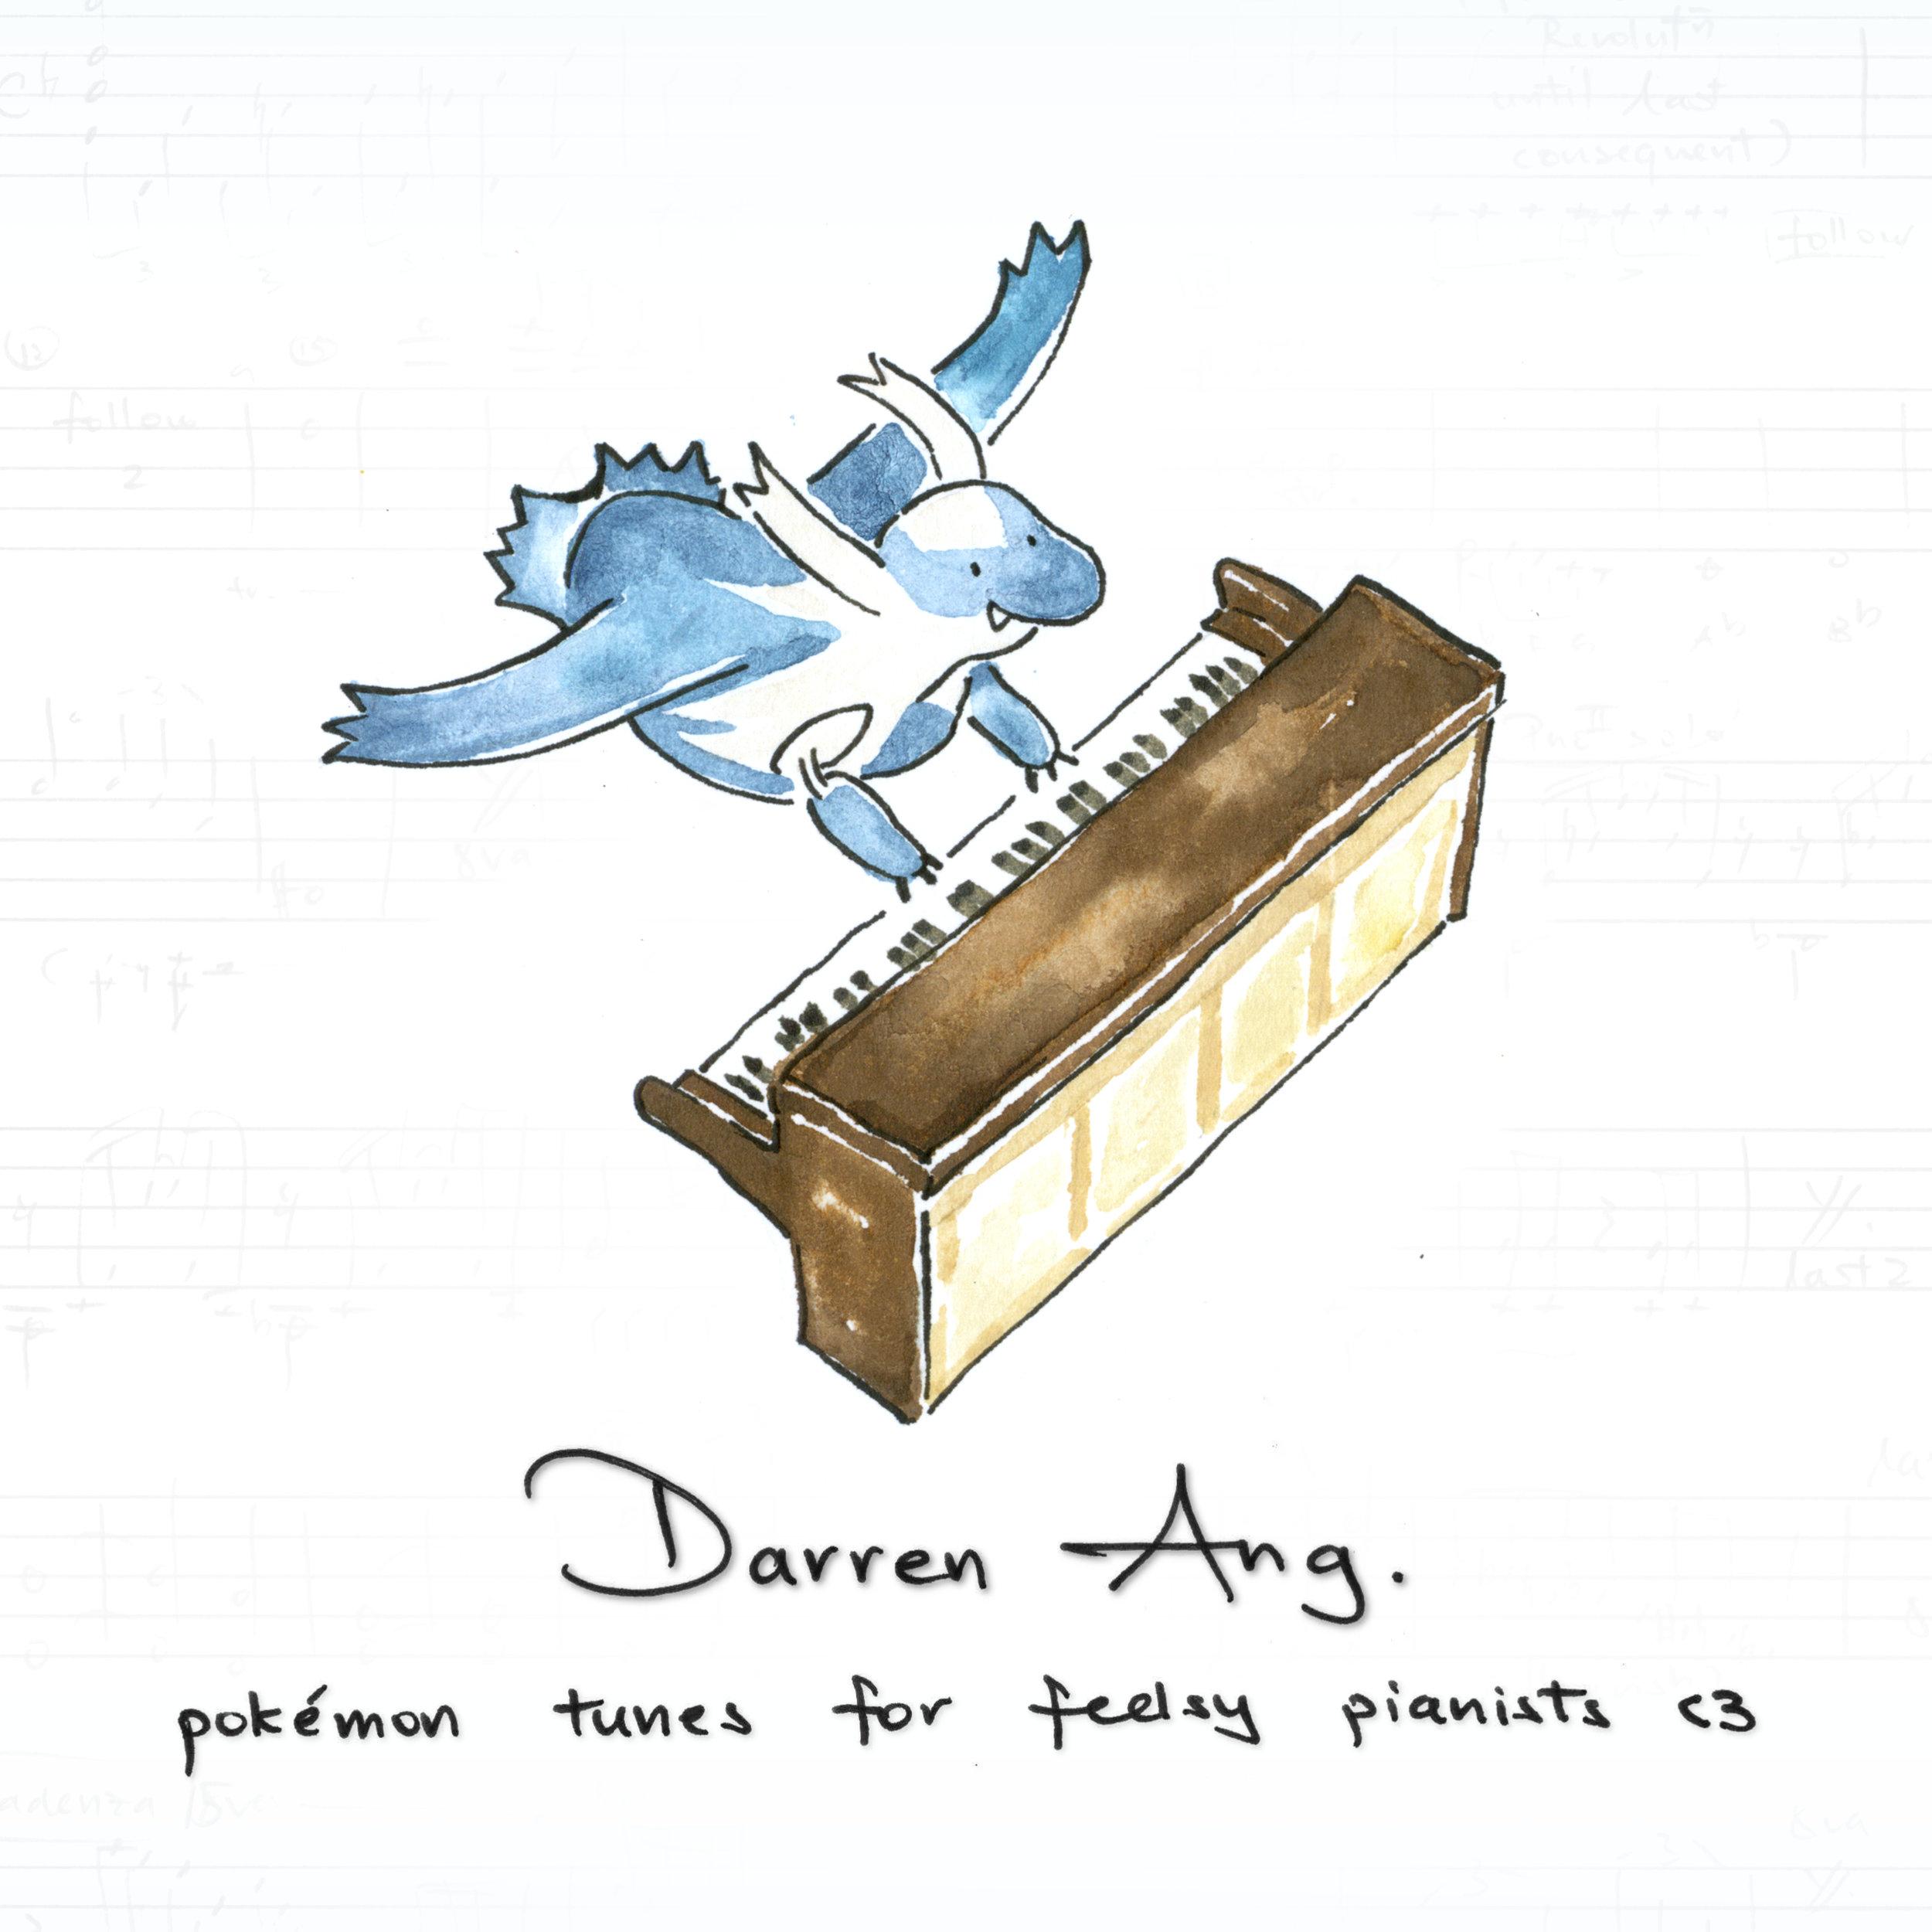 Pokemon Tunes for Feelsy Pianists - ALBUM COVER.jpg